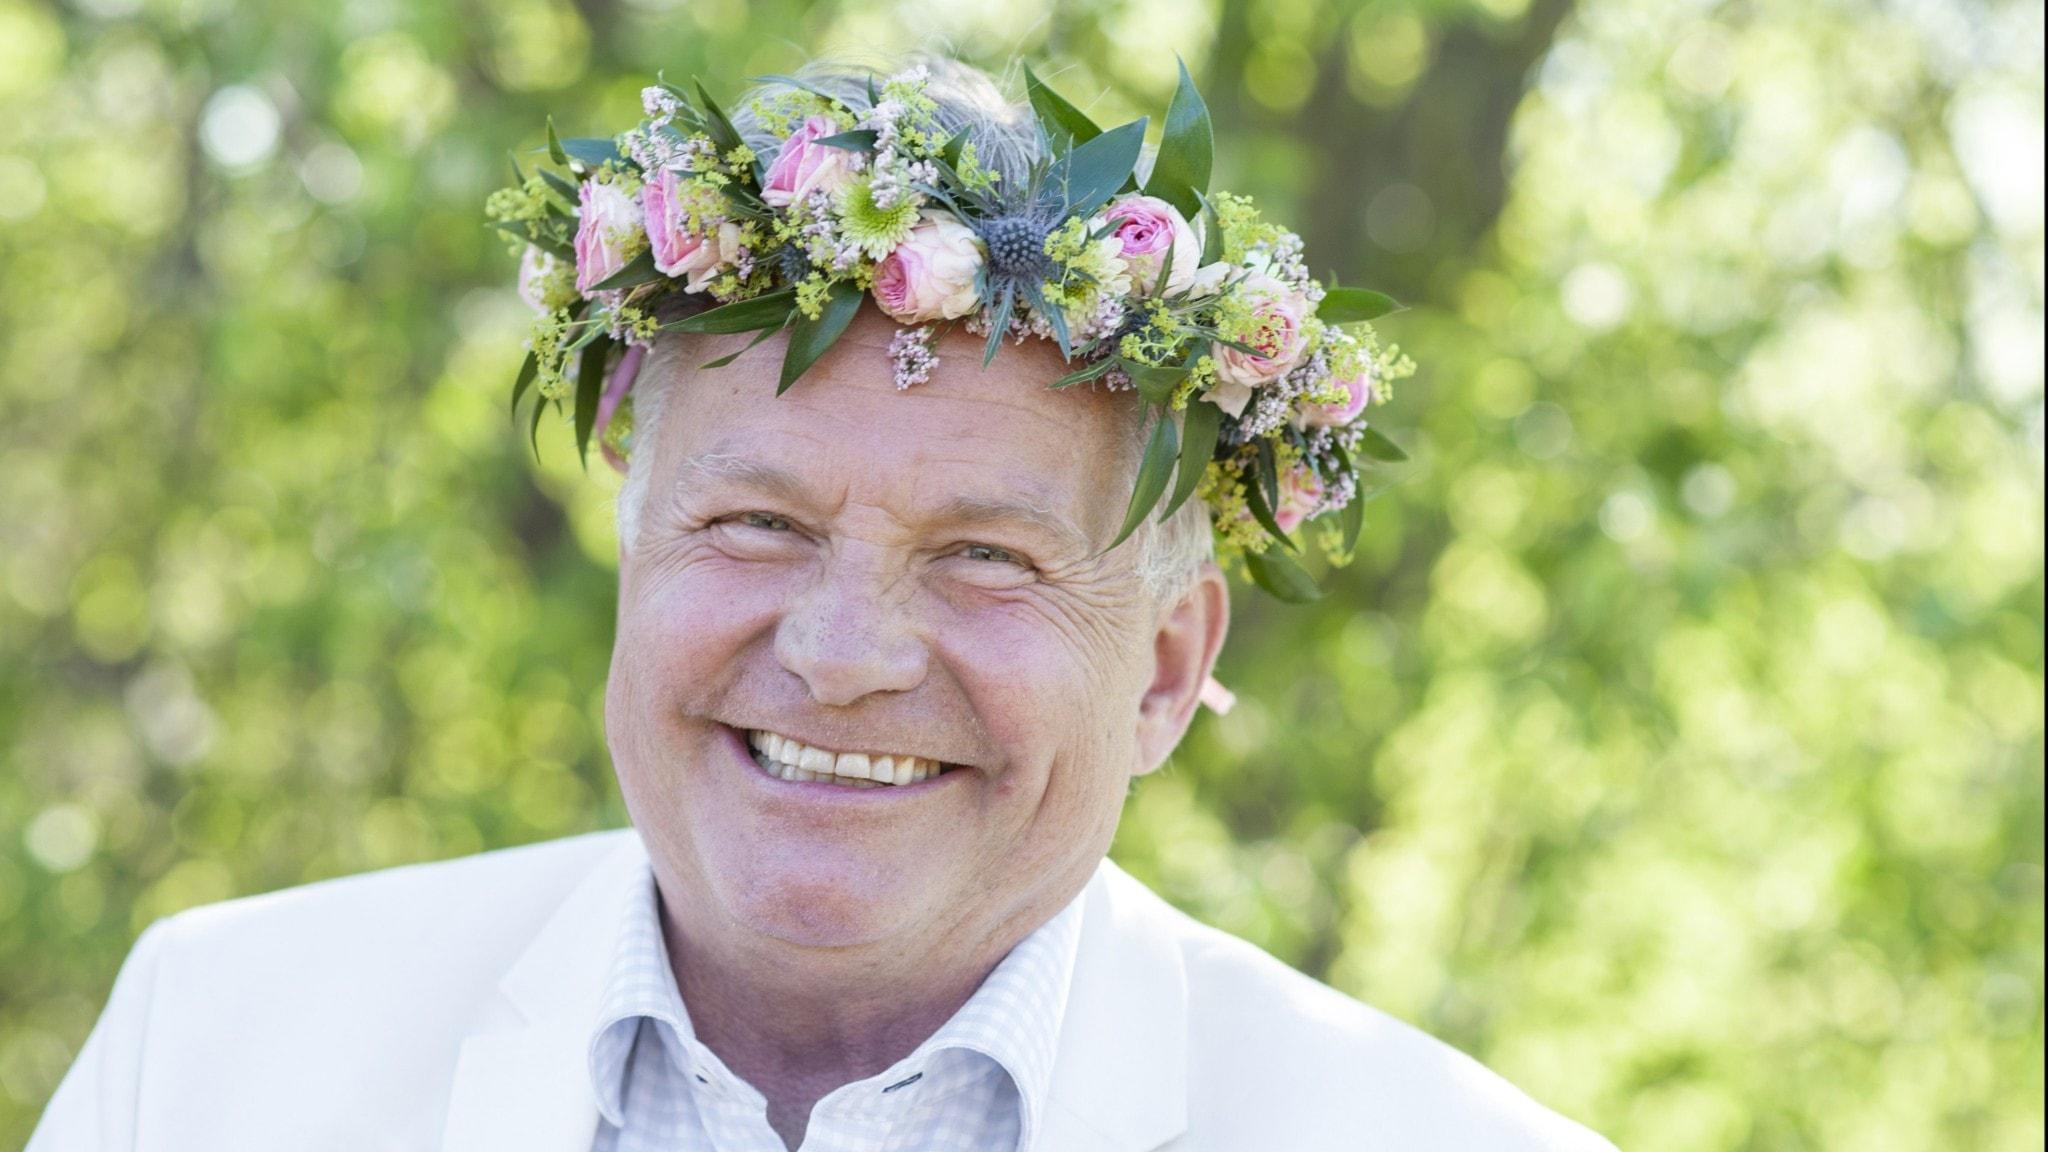 Svante Lindqvist